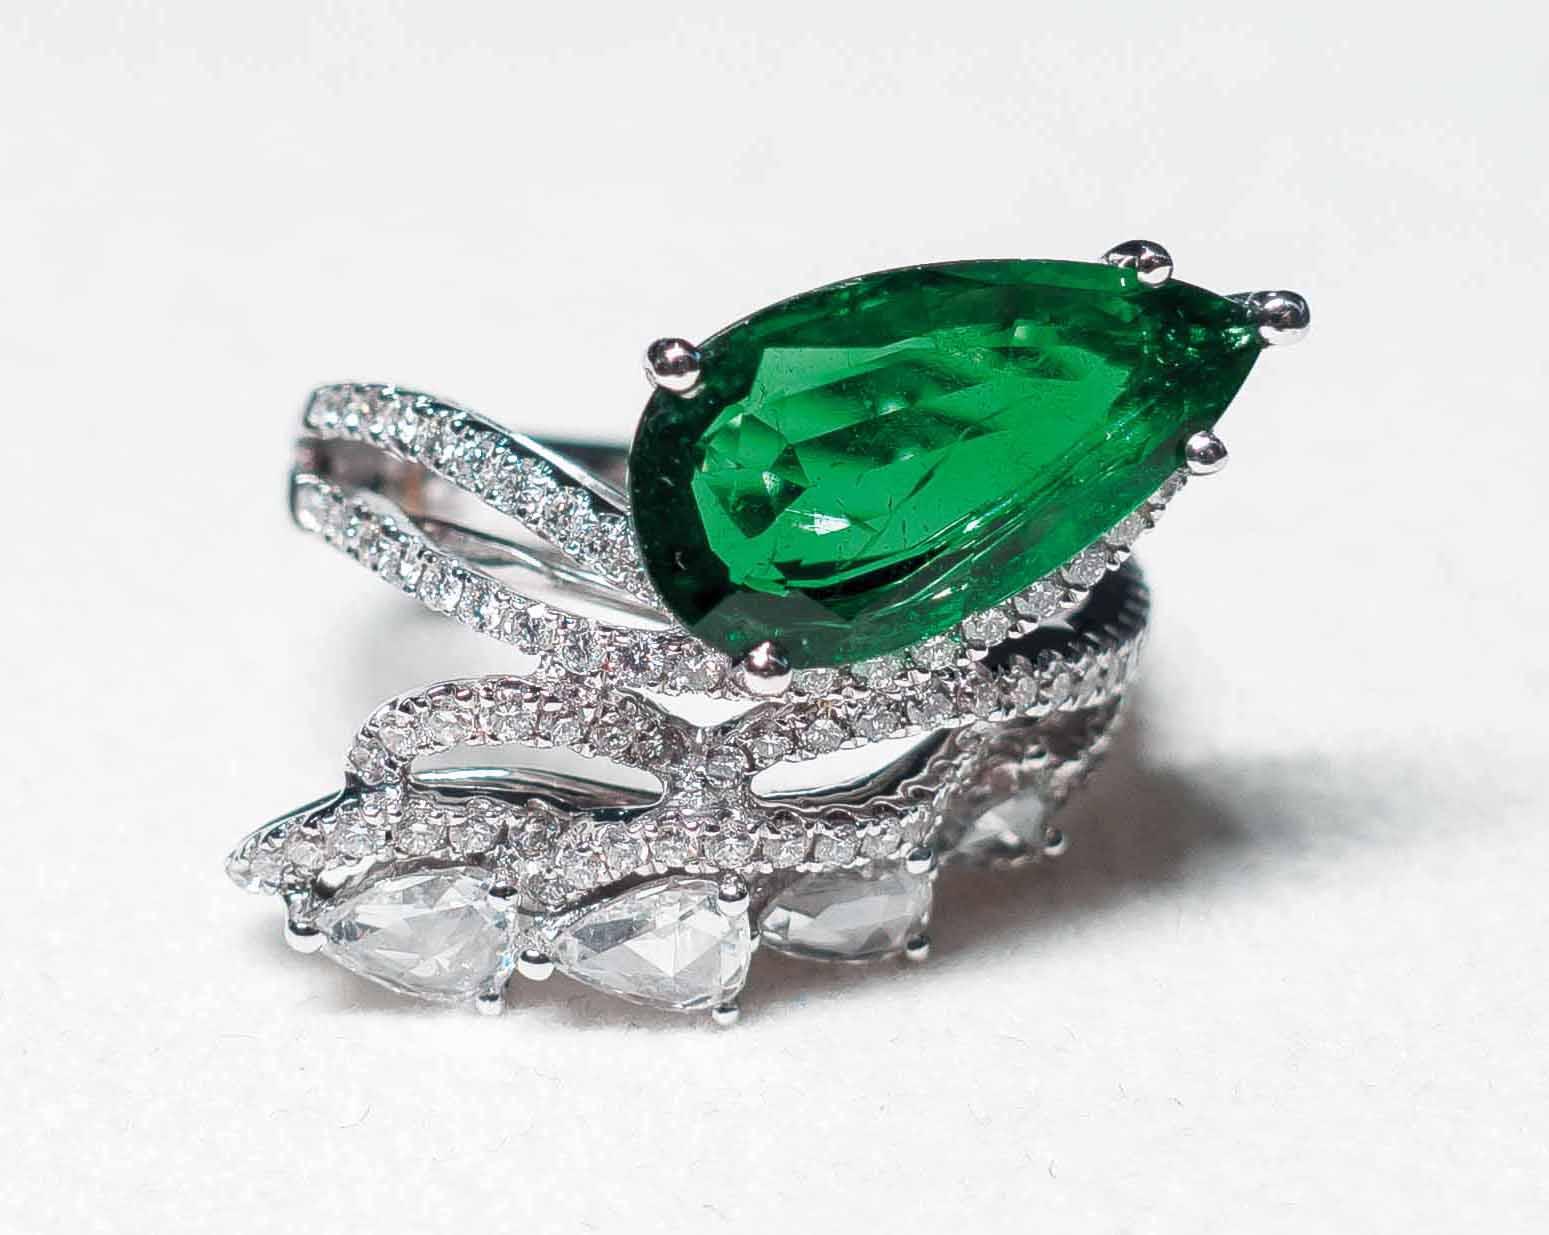 Exotic Gems & Jewellery